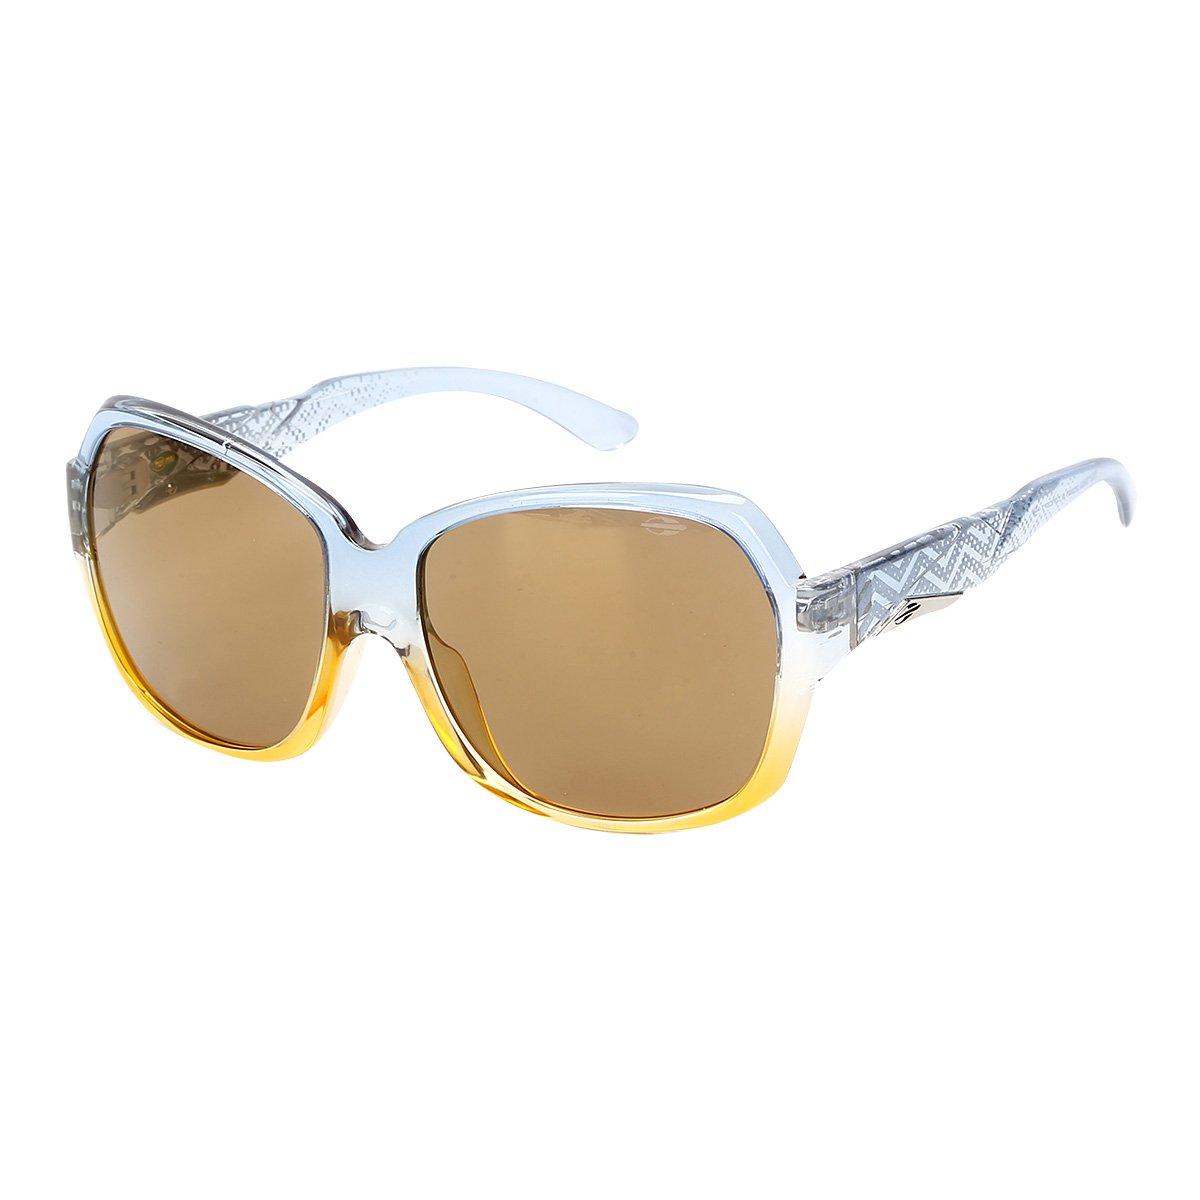 f2d7488ed5033 Óculos de Sol Mormaii Santa 36438281 Feminino